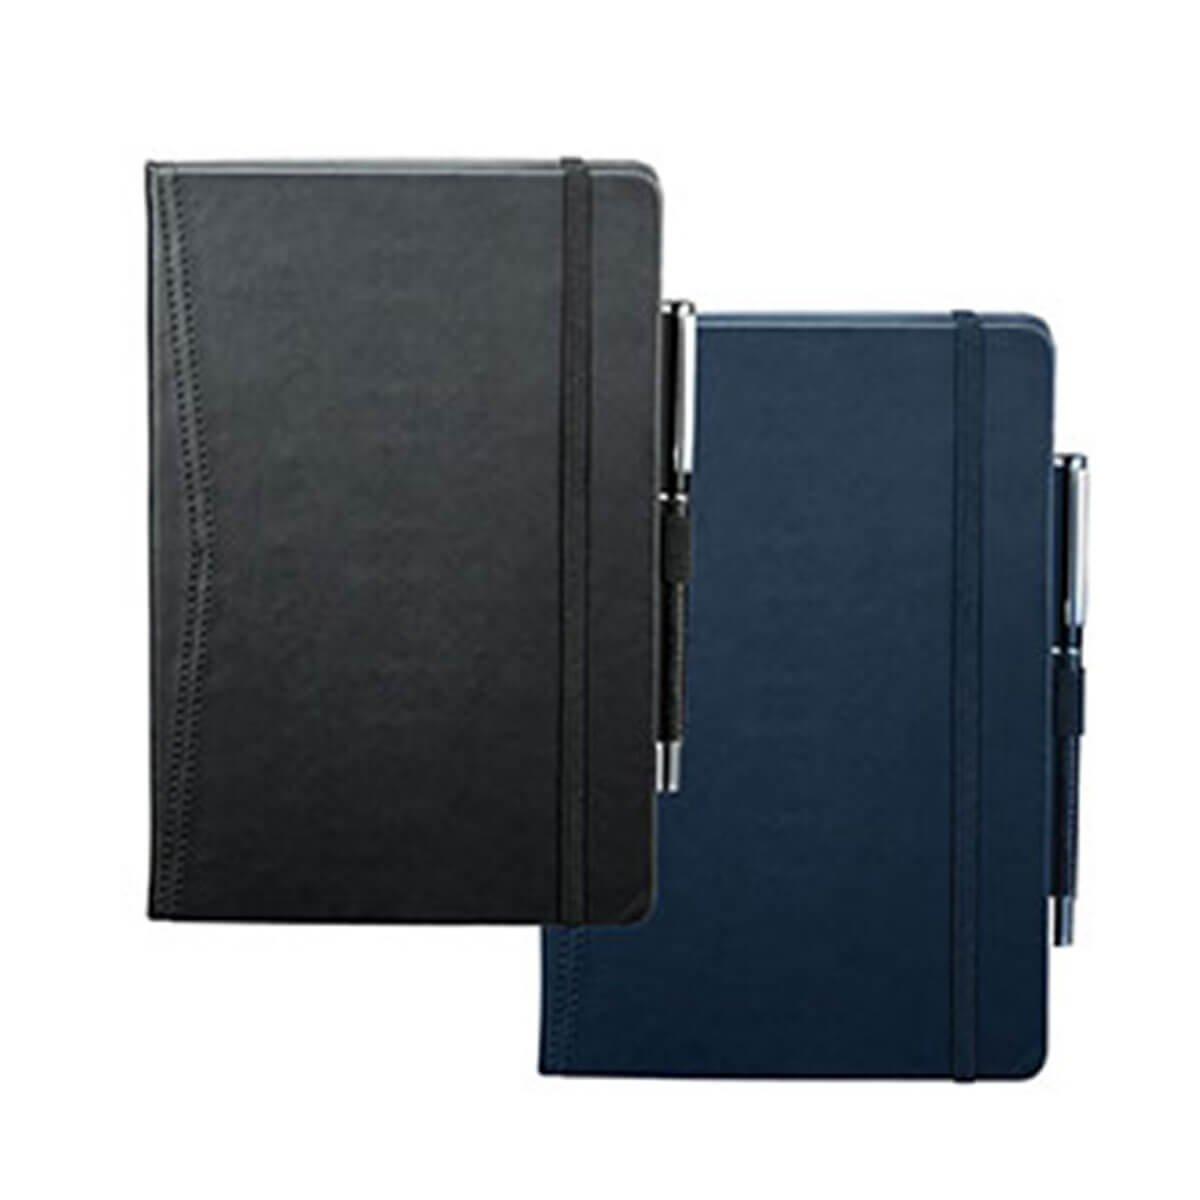 Pedova Pocket Bound JournalBook-Black with black elastic.